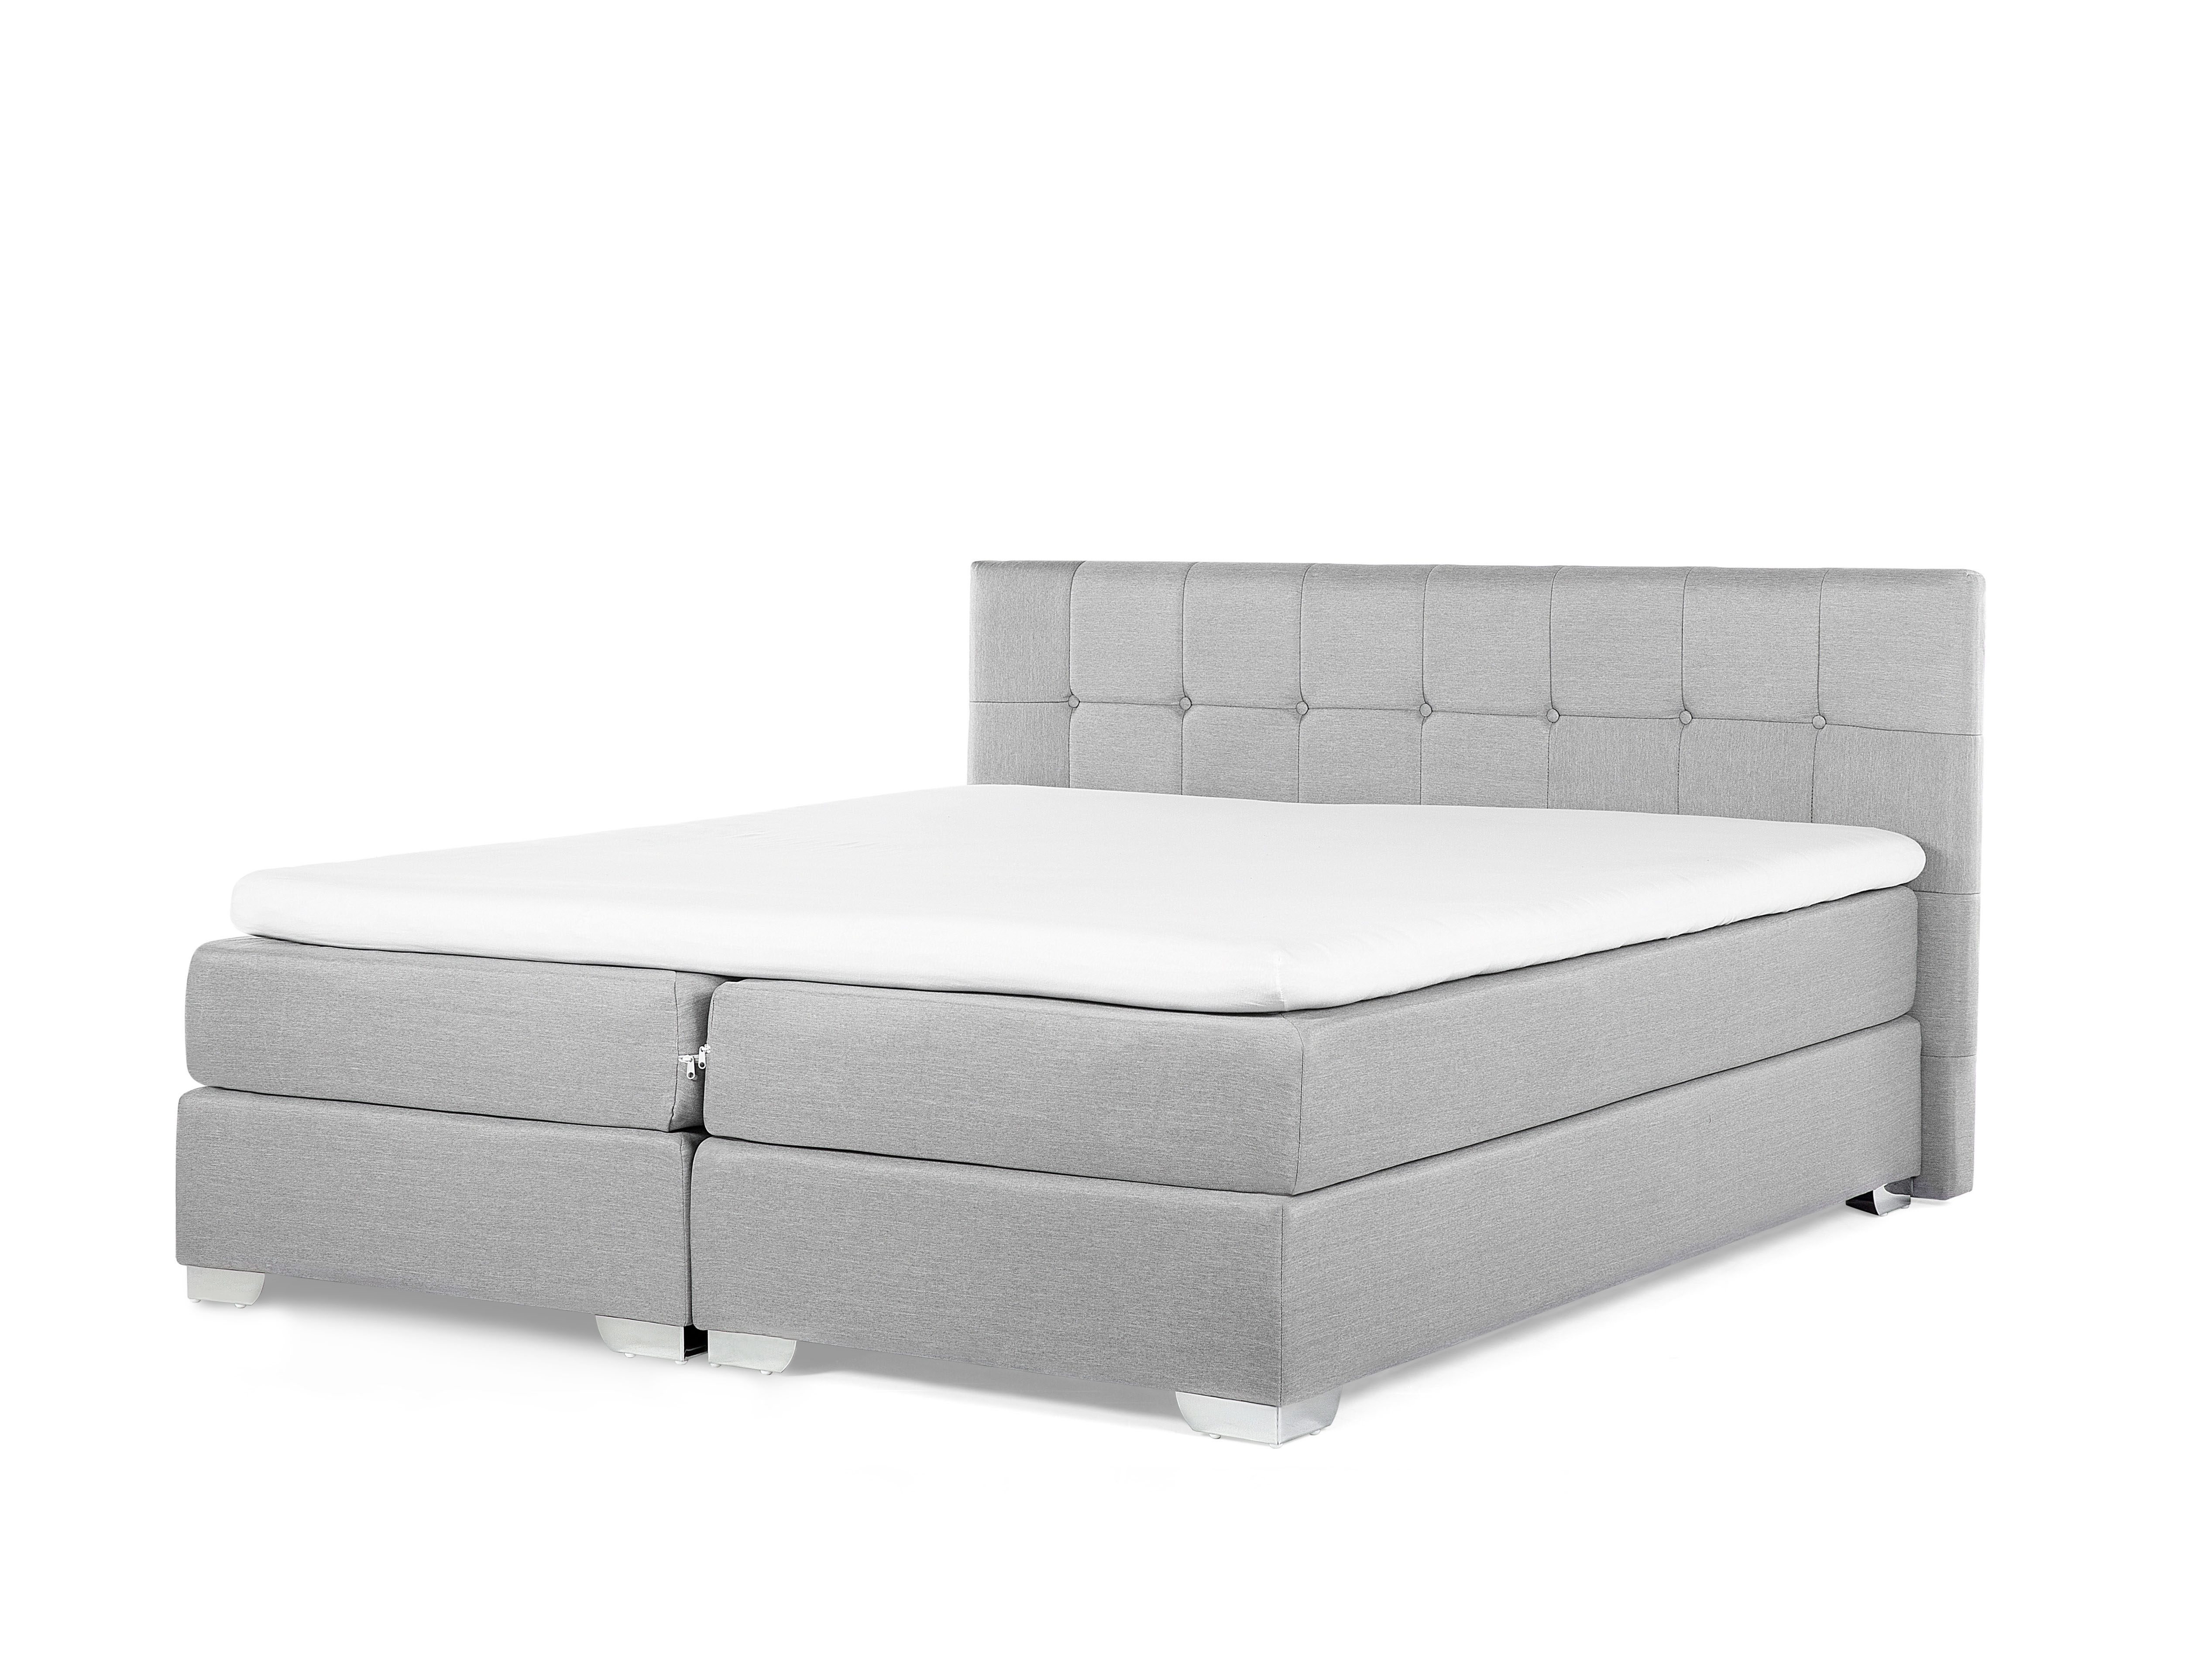 Contour De Lit 160×200 Inspirant Fabric King Size Divan Bed Light Grey Admiral